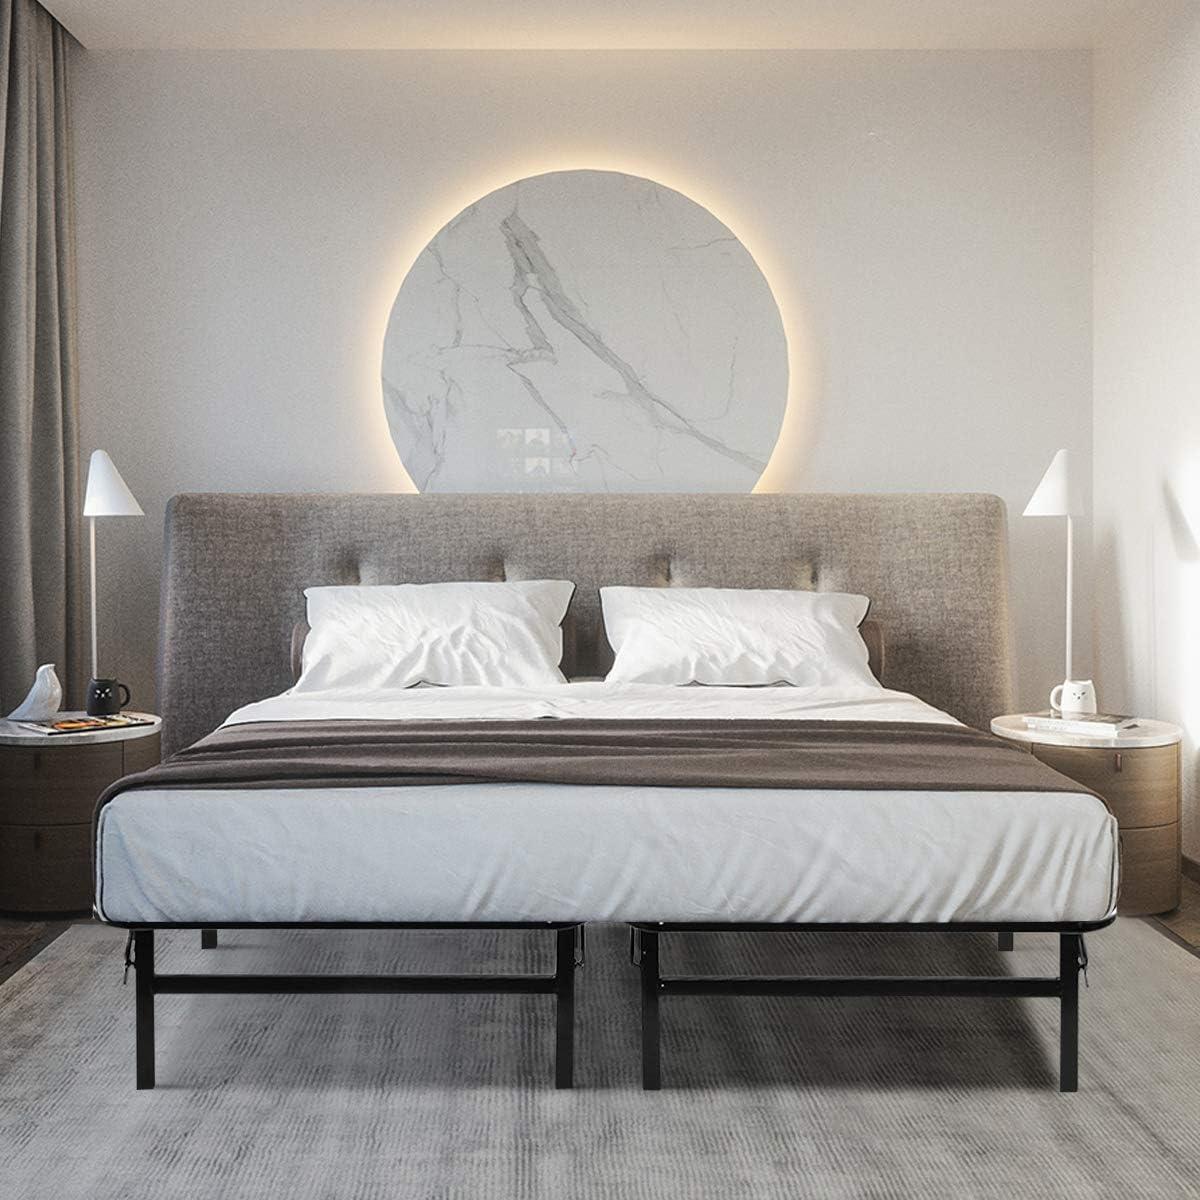 Giantex Platform Metal Bed Frame Mattress Foundation 5 Box Springs Queen Size , Black